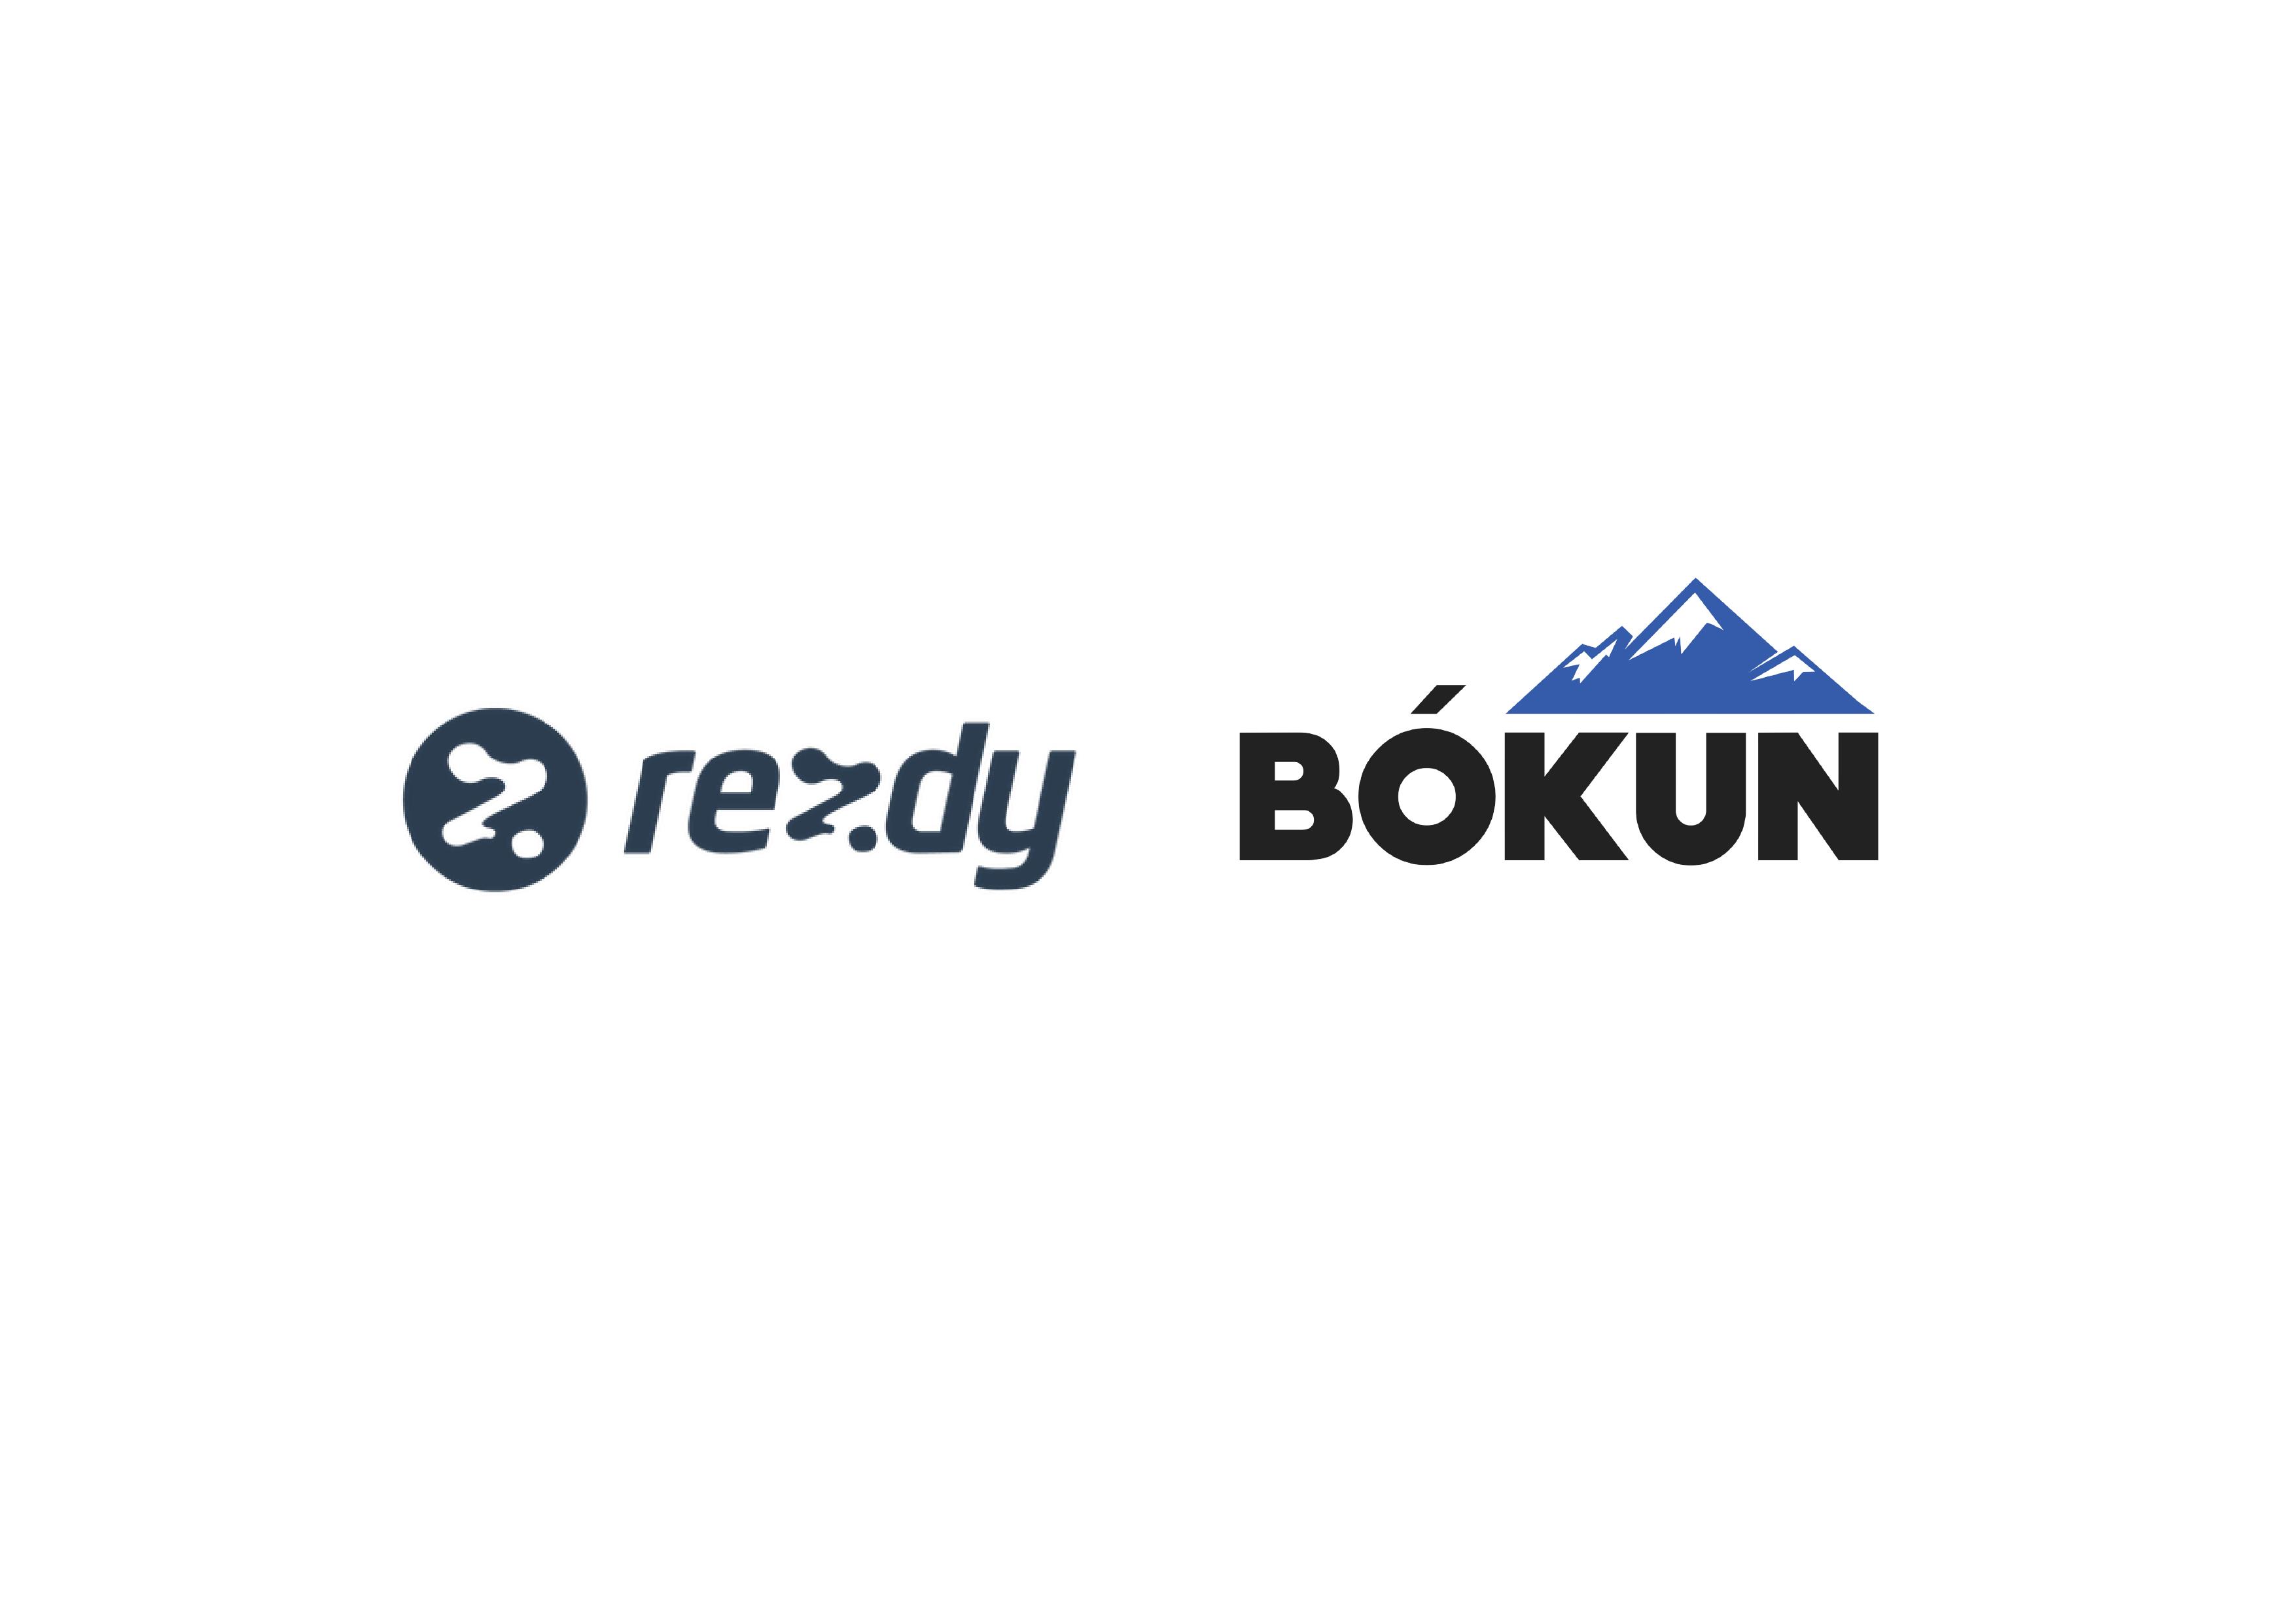 TripShock Rolls out Rezdy and Bókun Integrations